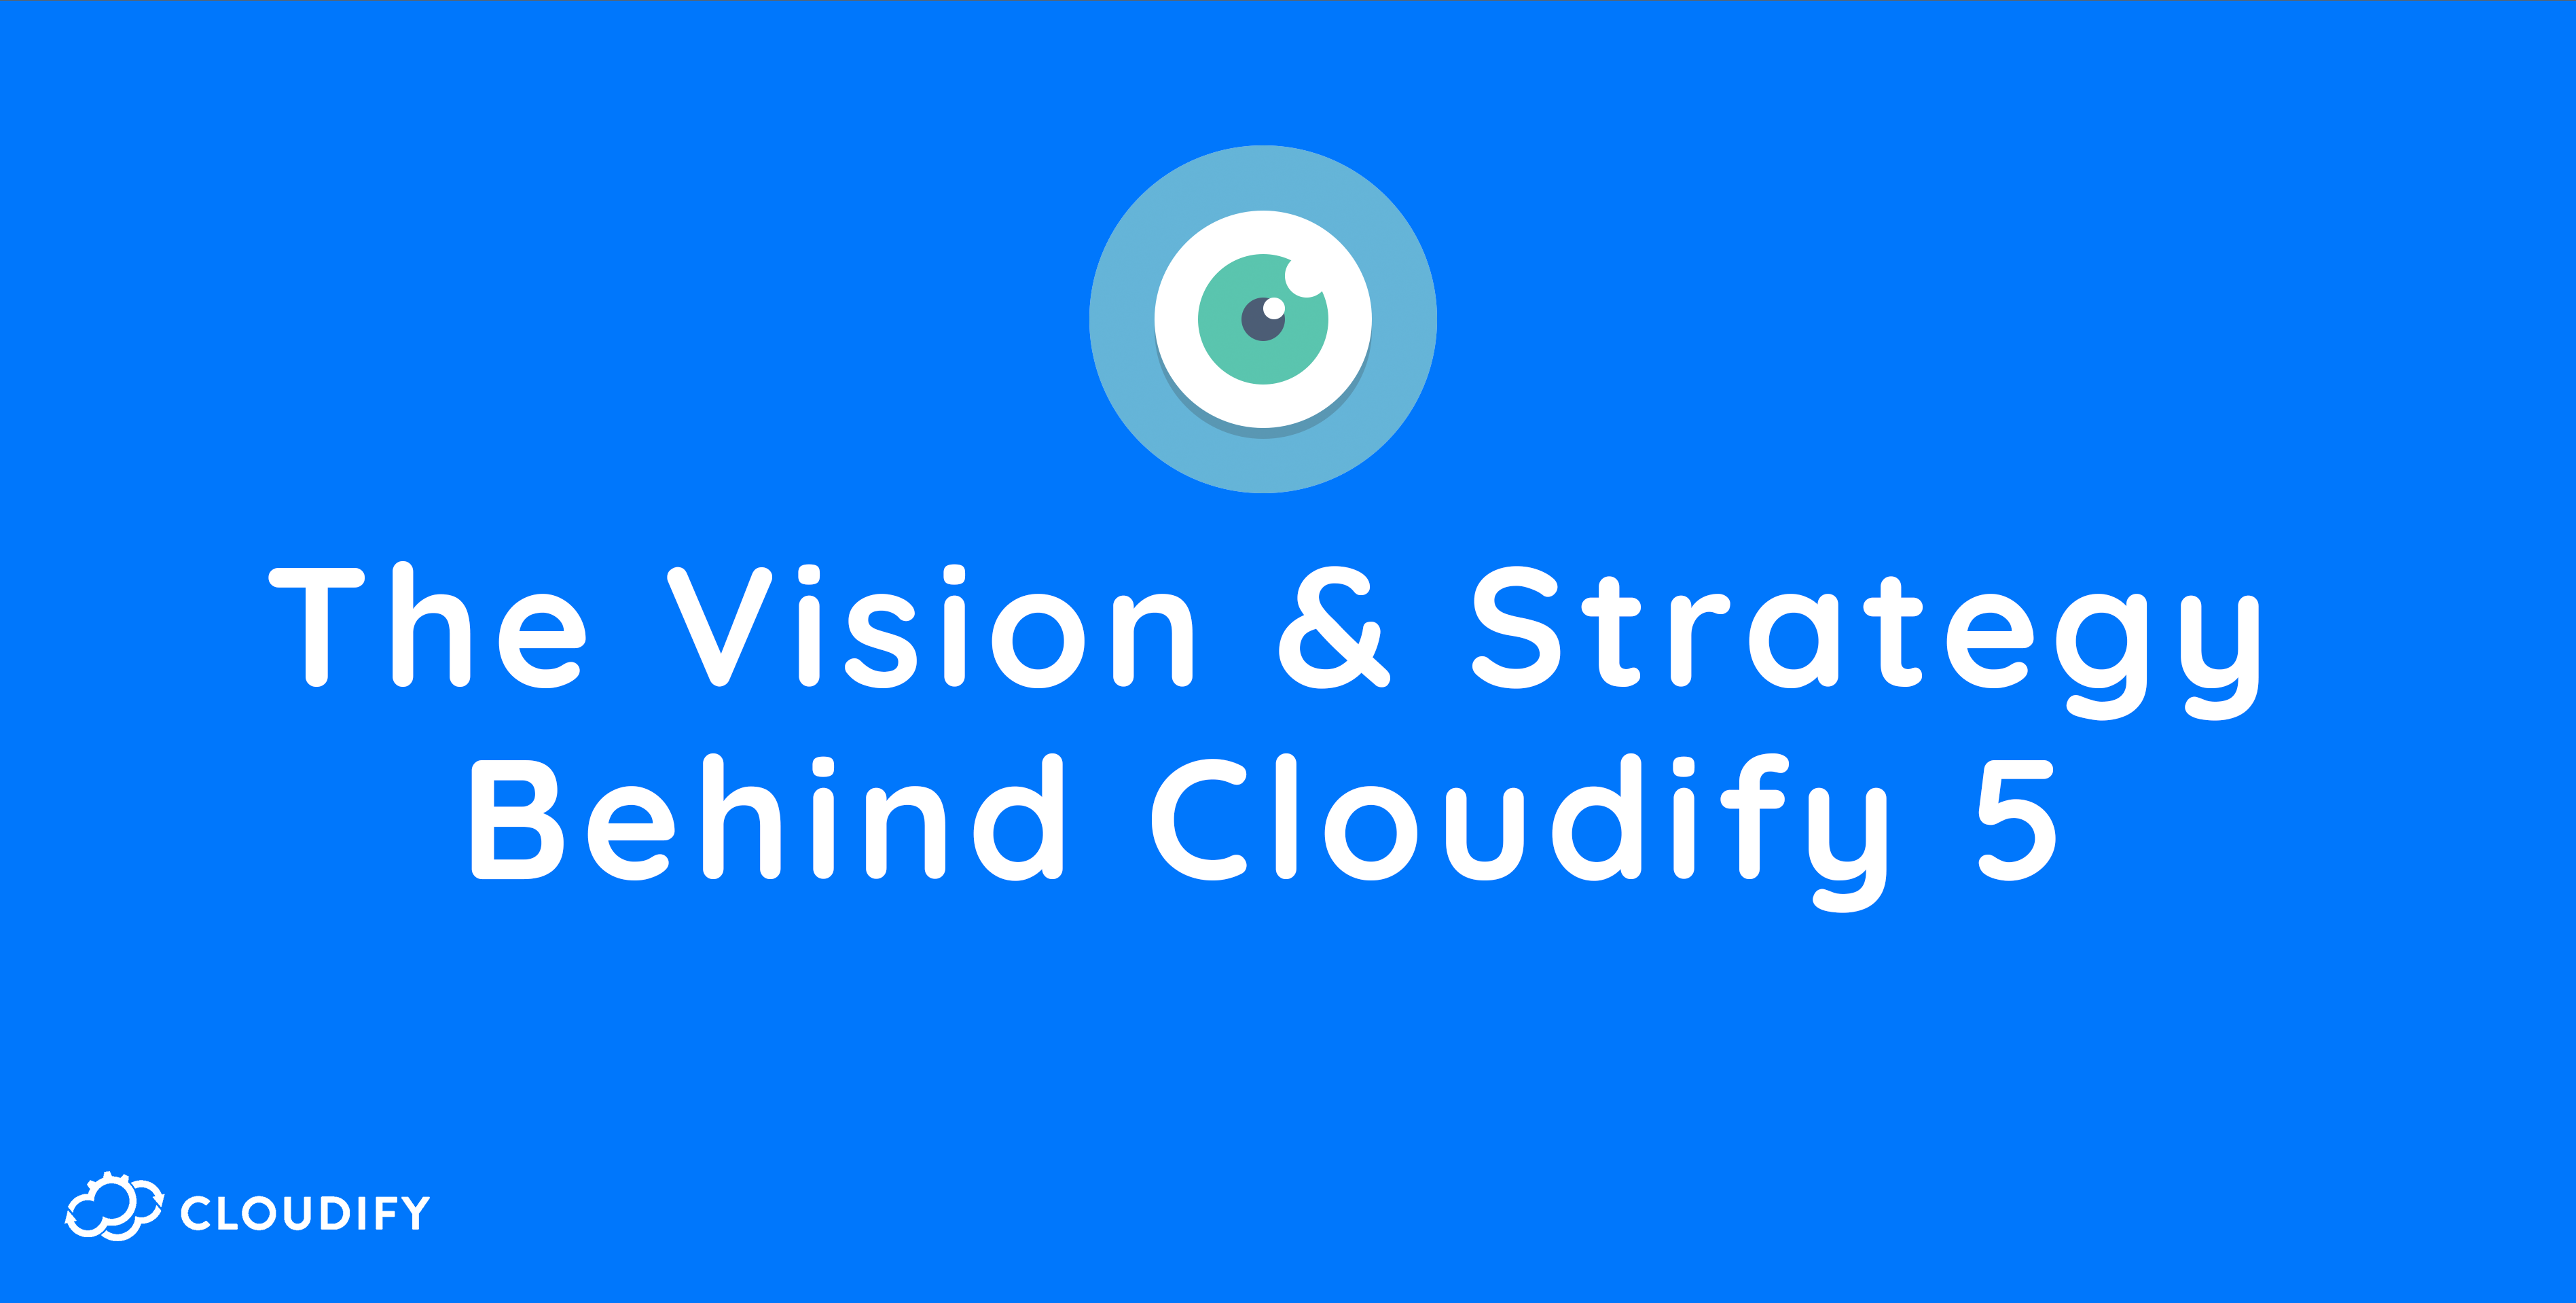 vision strategy cloudify 5